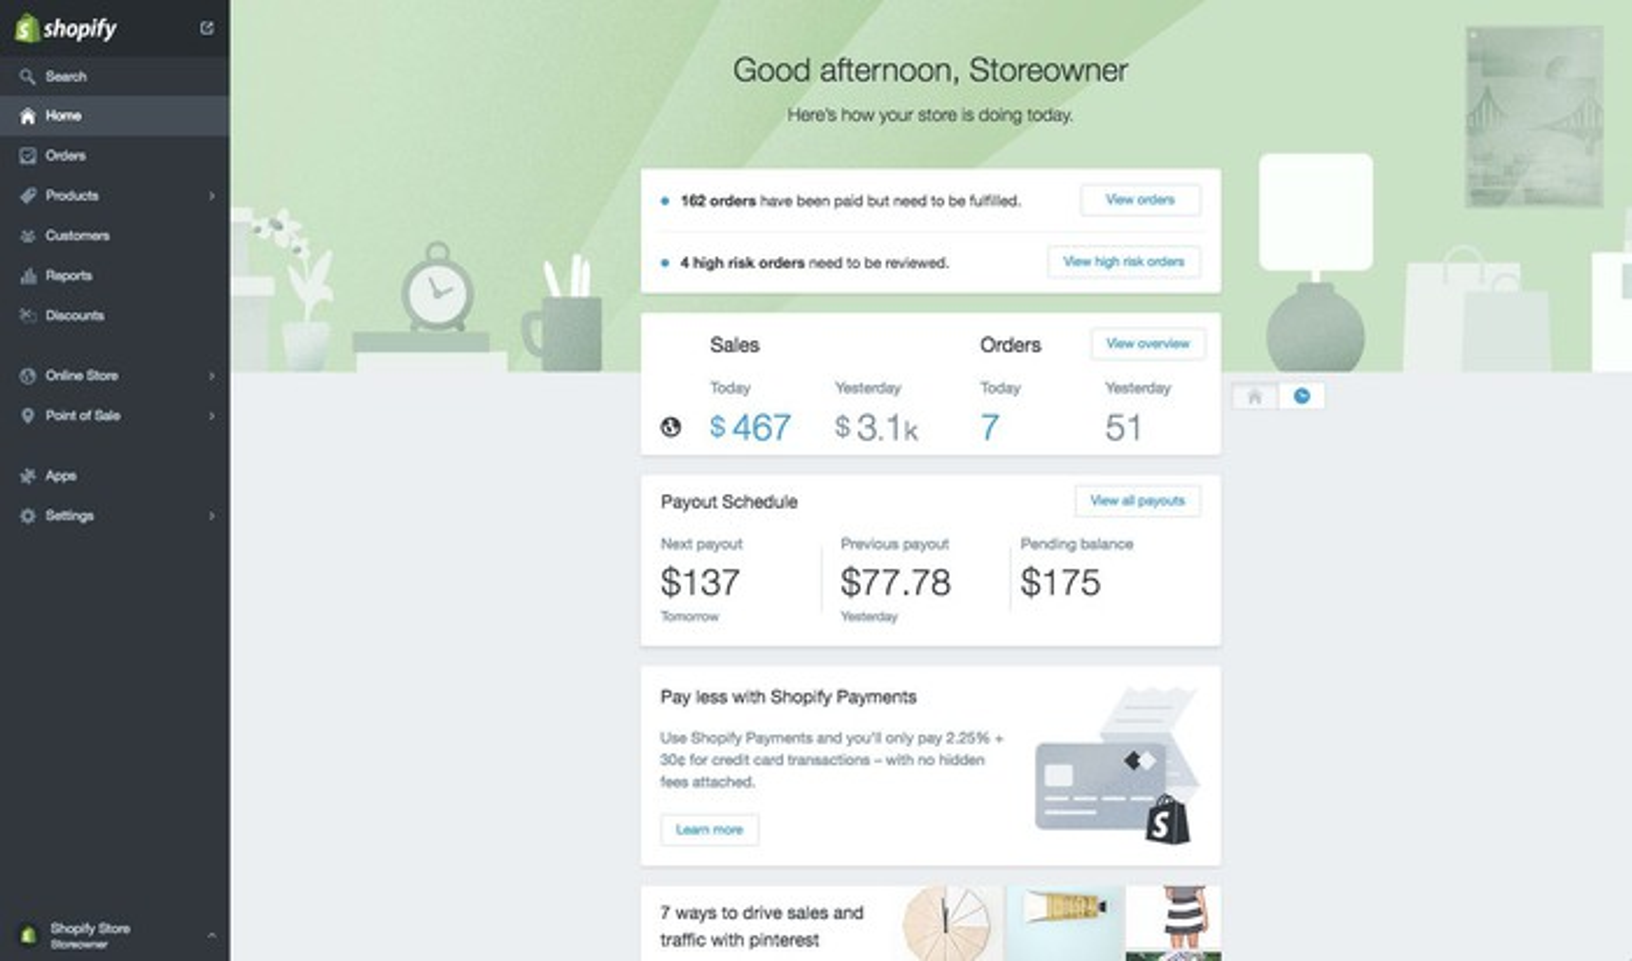 Screenshot of business analysis metrics on Shopify platform.